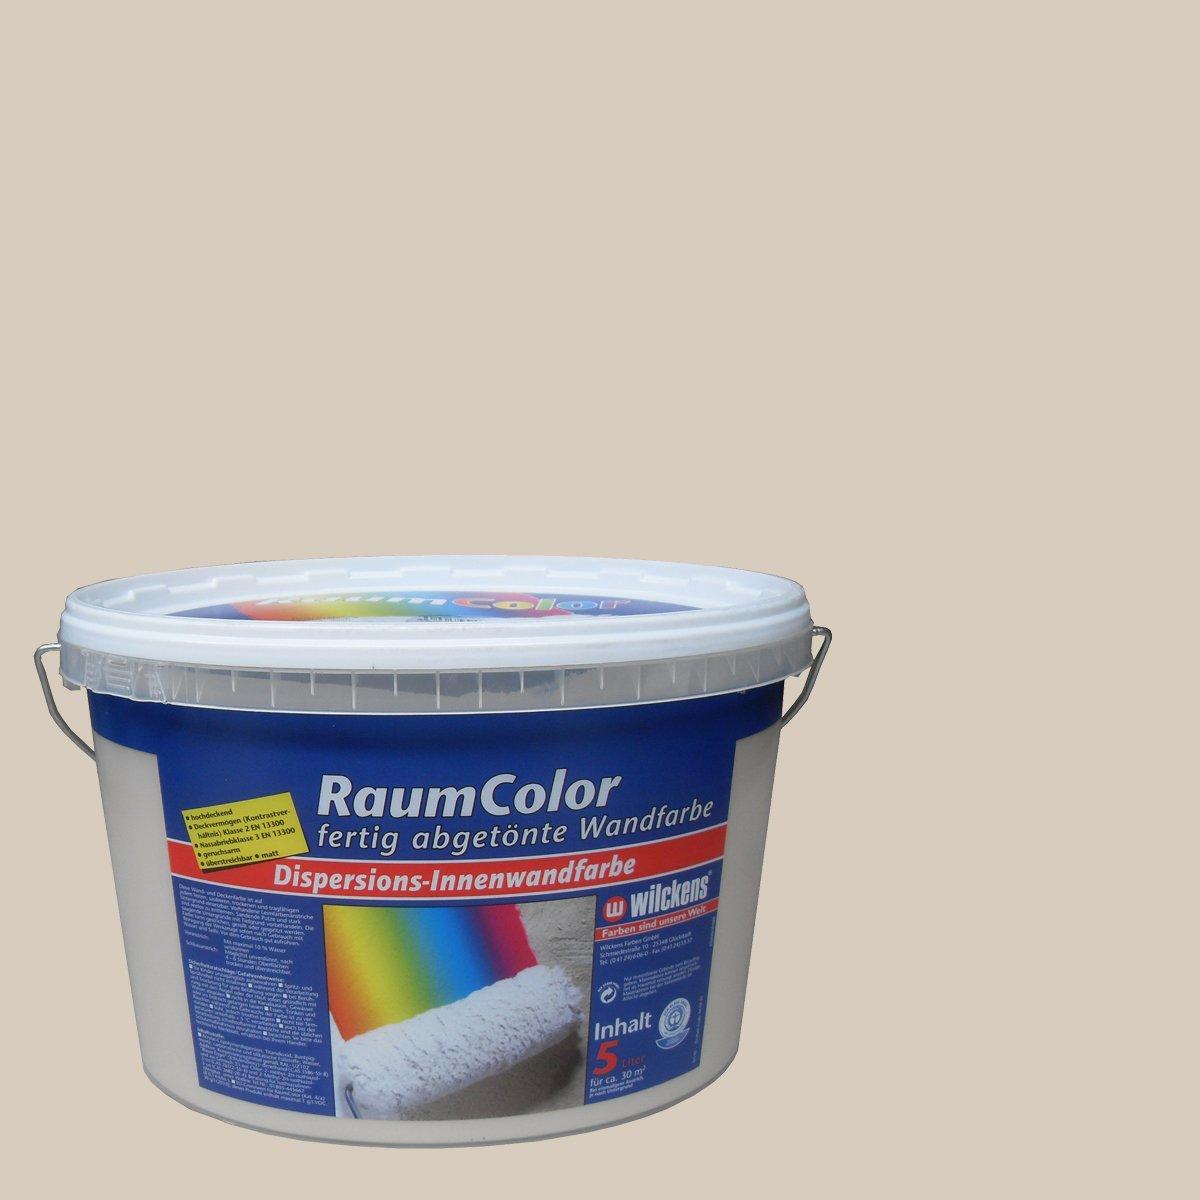 Wilckens Raumcolor 5l, Farbton:Cappuccino: Amazon.de: Baumarkt